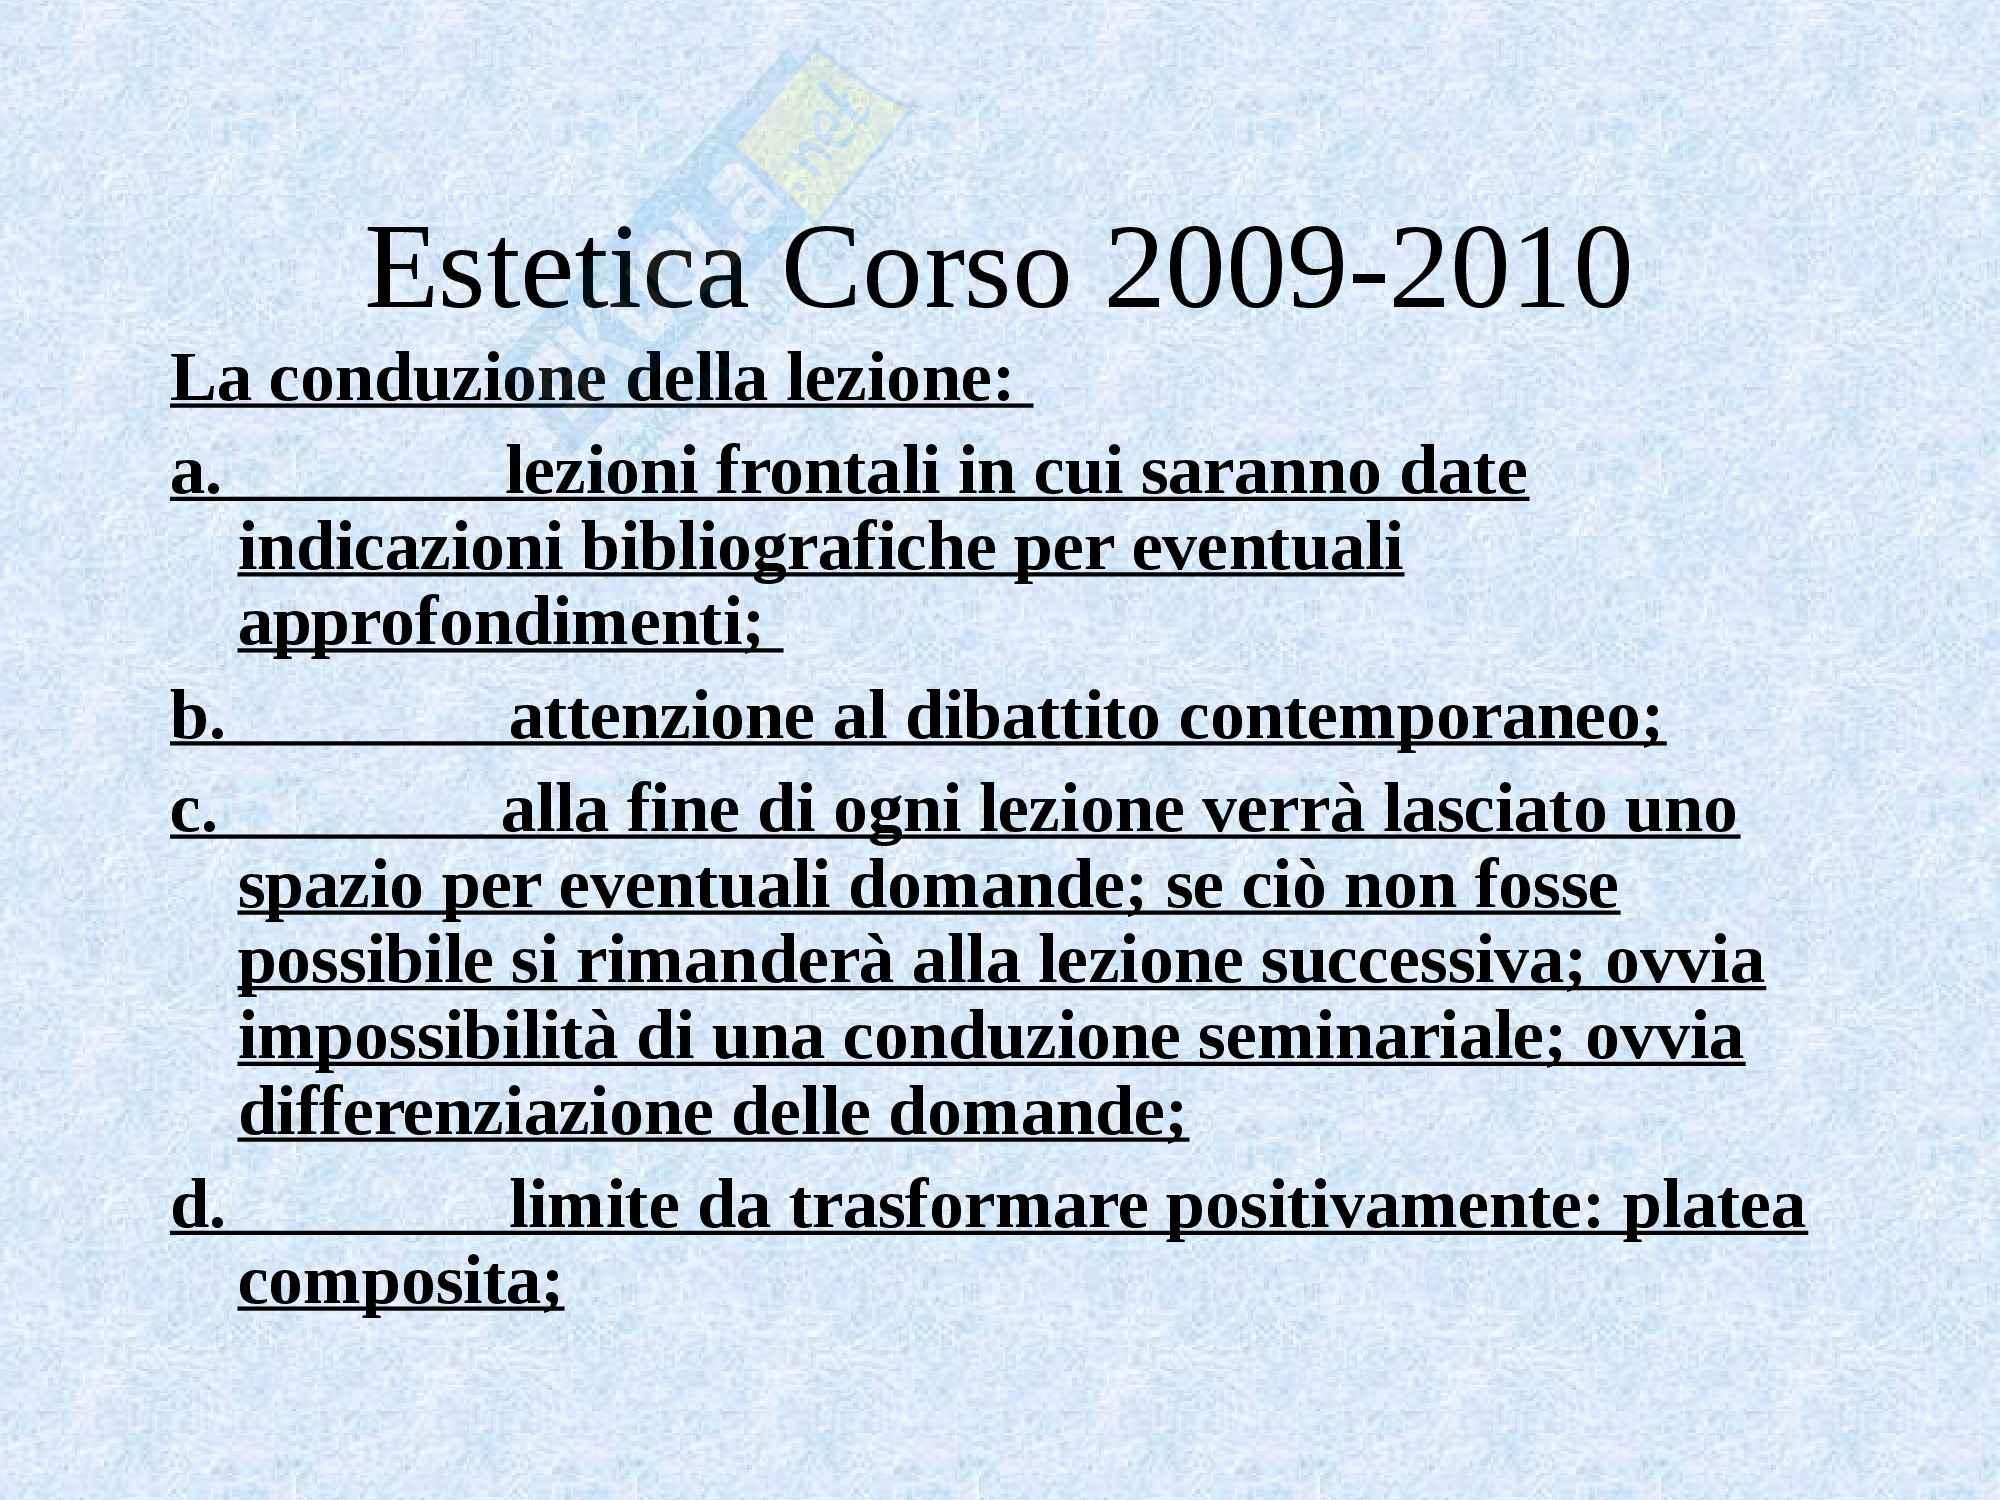 Estetica - lo studio dell'estetica Pag. 11